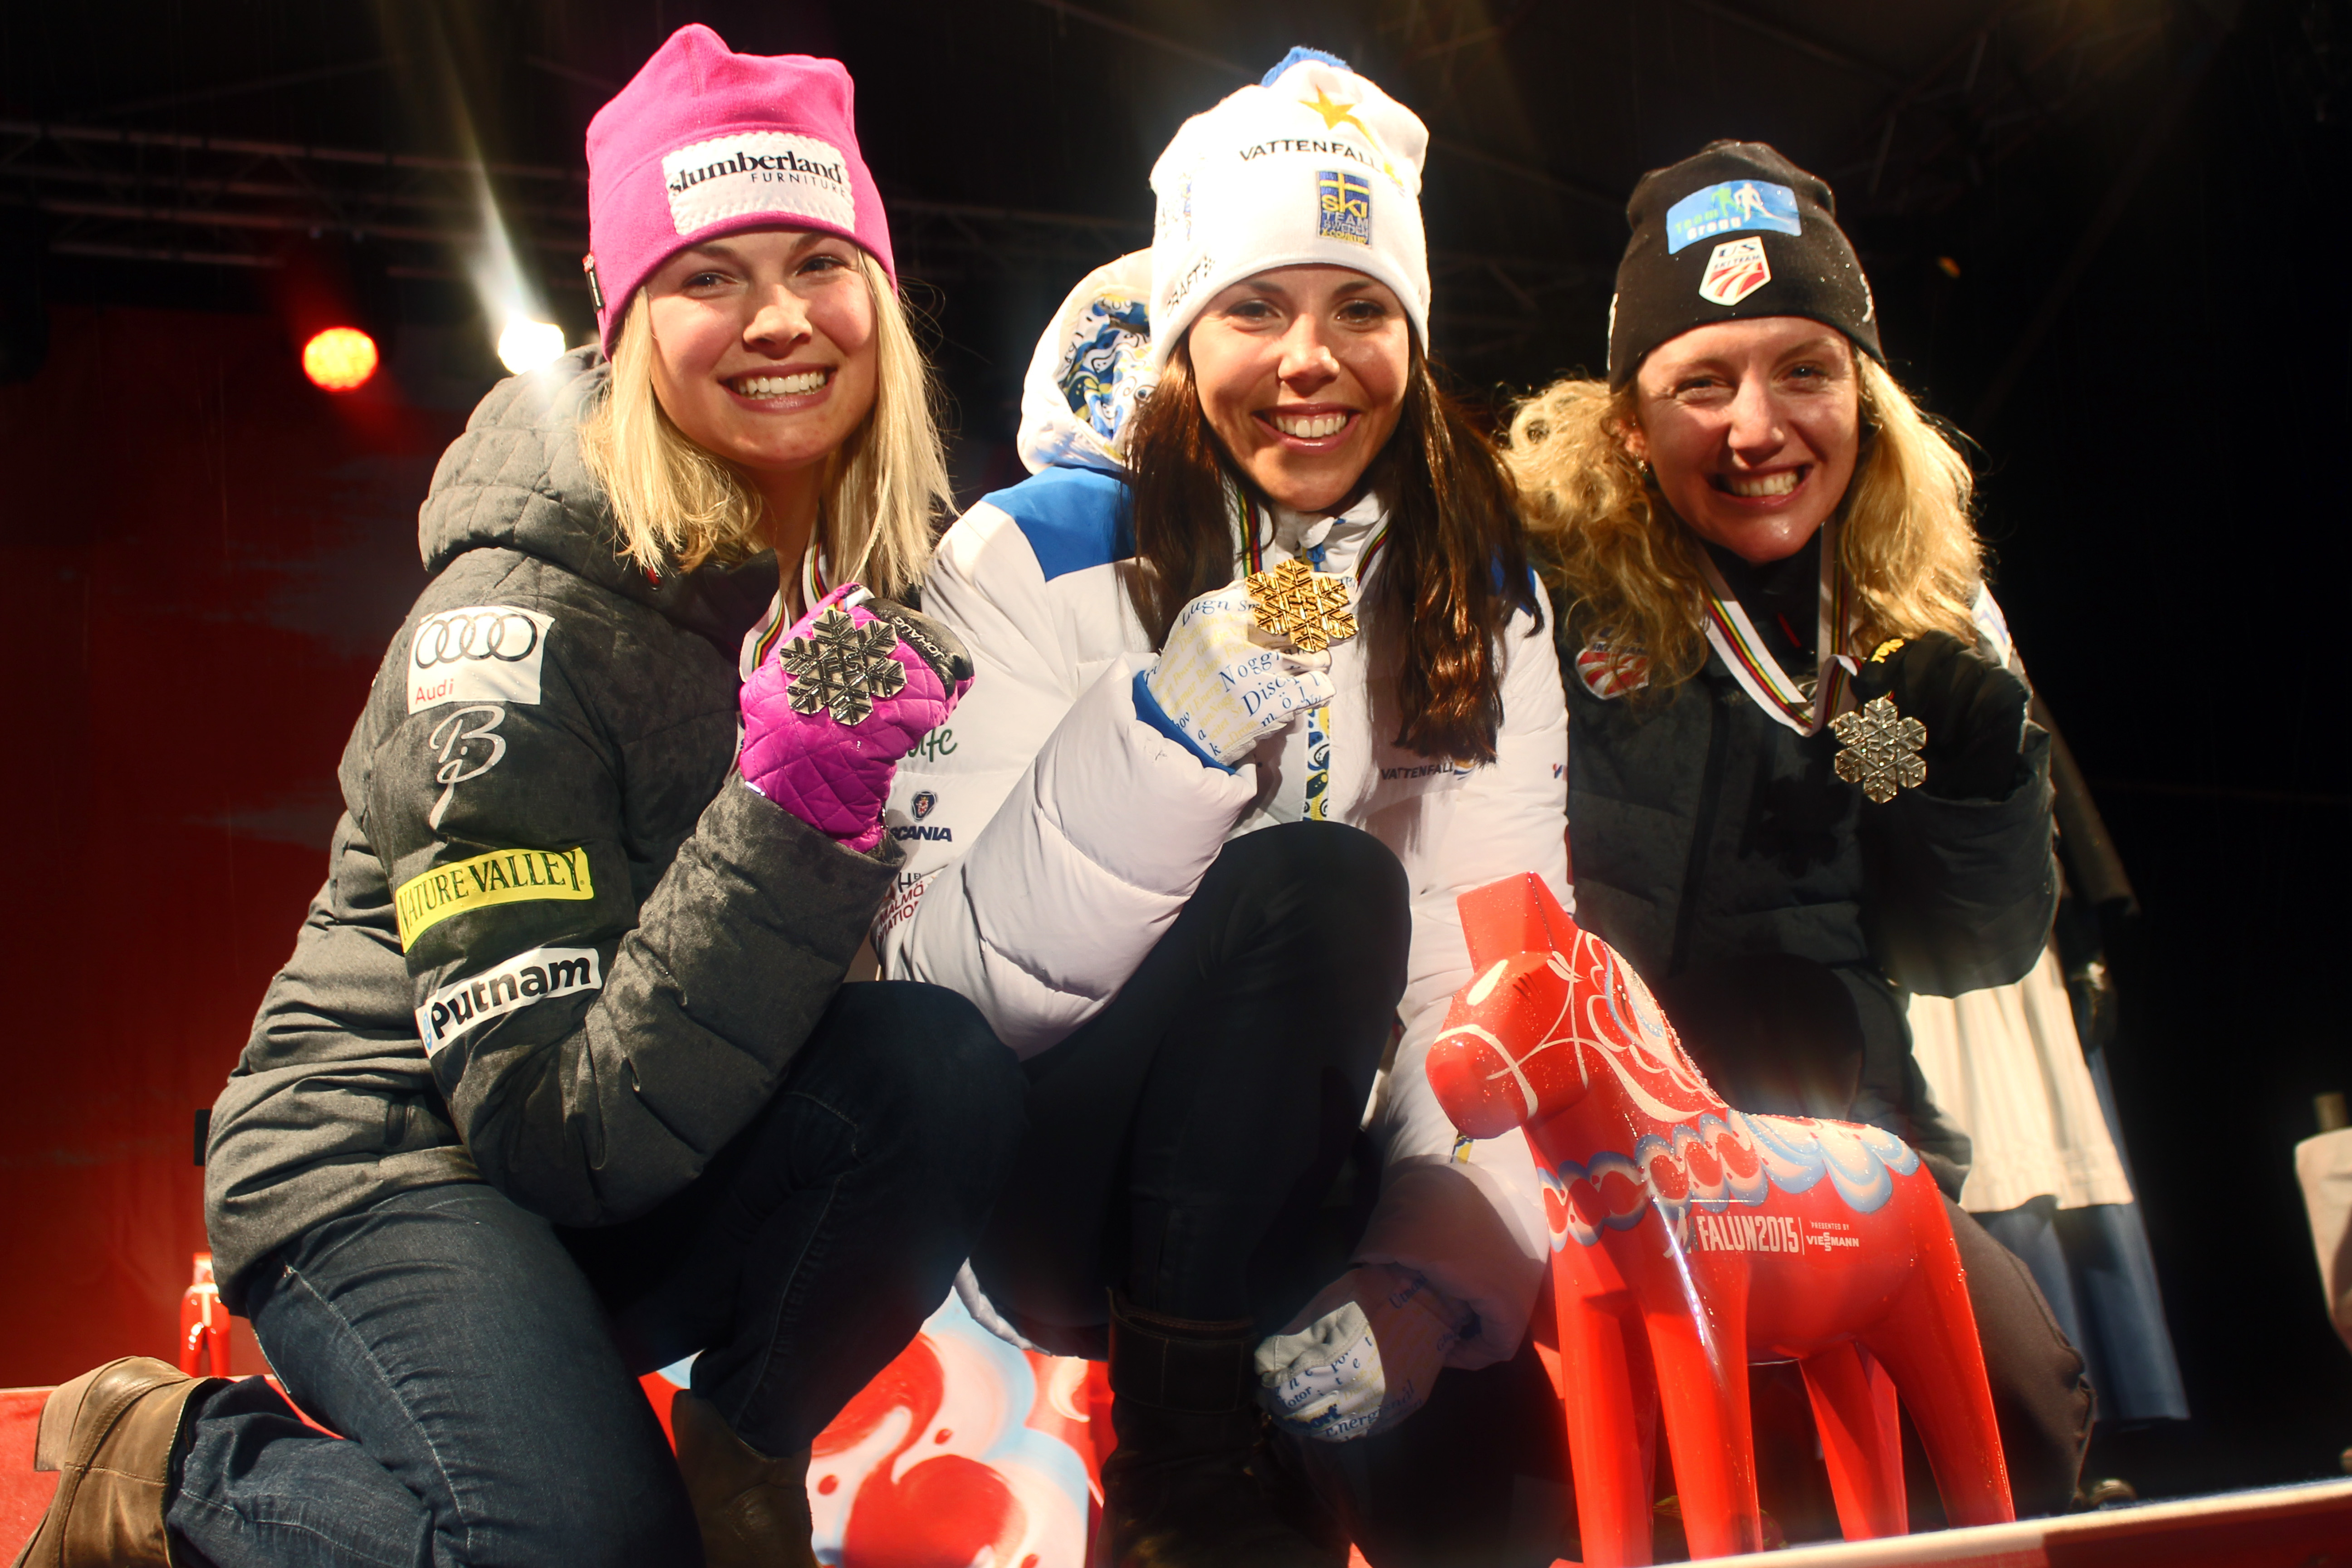 https://fasterskier.com/wp-content/blogs.dir/1/files/2015/02/podium_ceremony_kneel.jpg